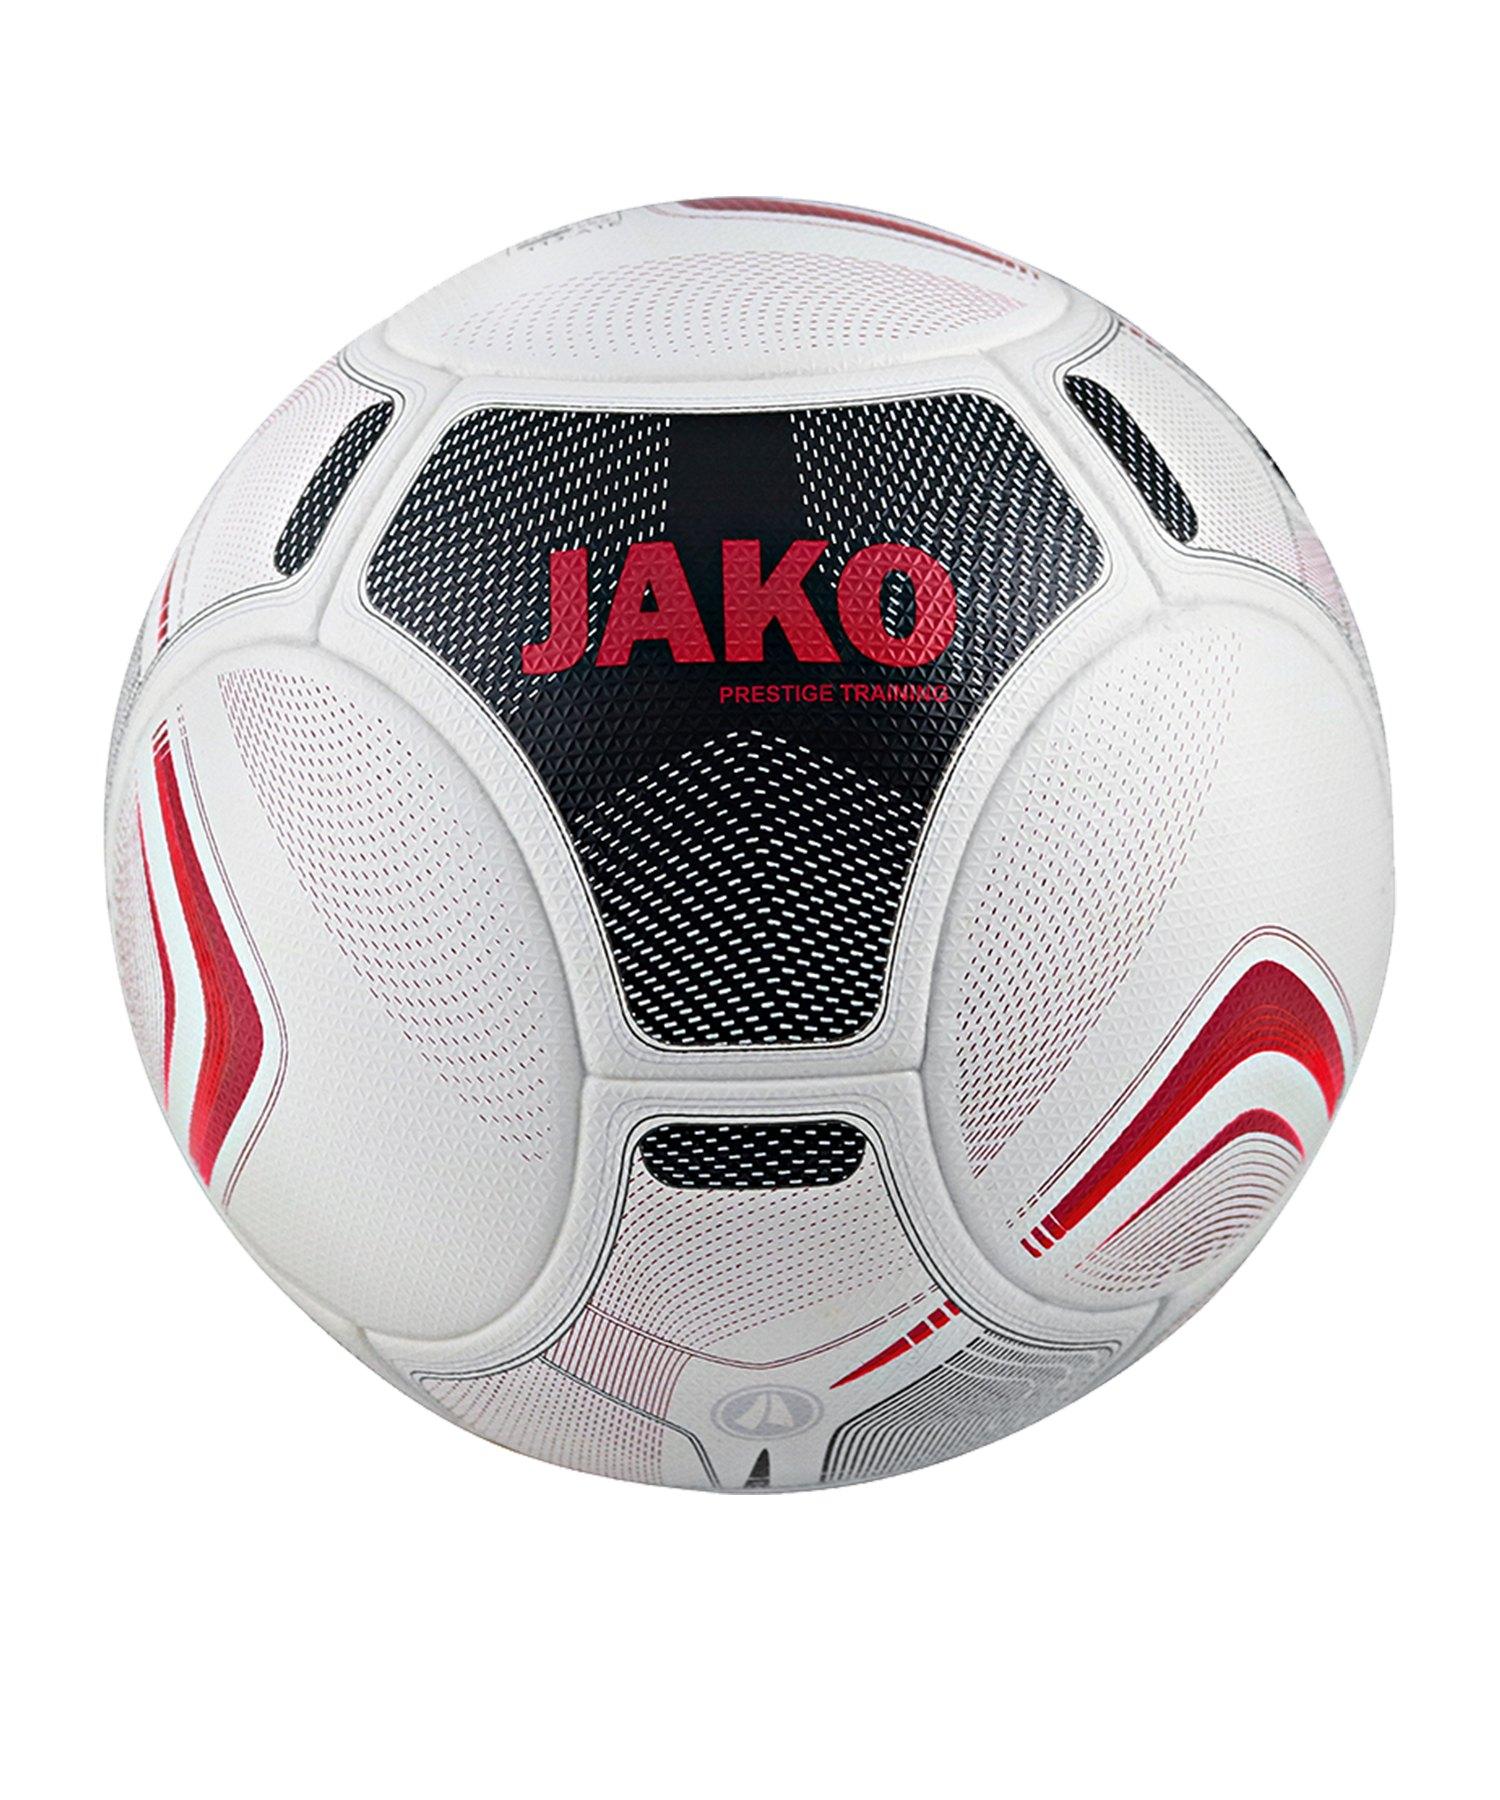 Jako Prestige Trainingsball Weiss Schwarz Rot F00 - weiss